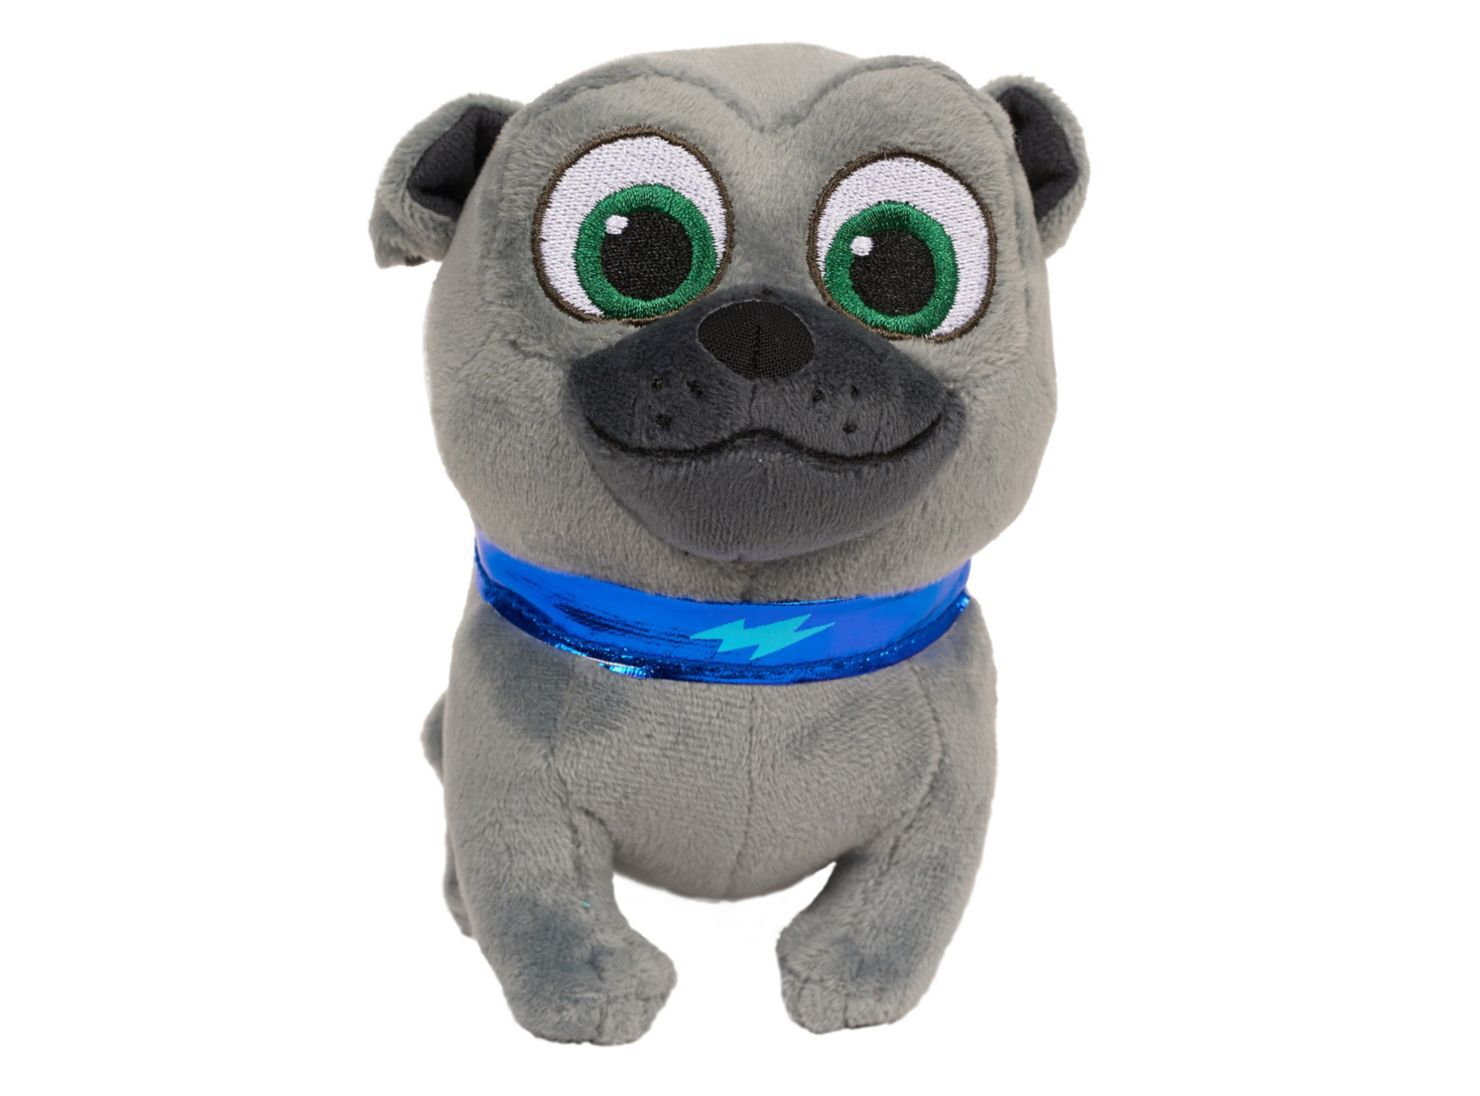 Peluche Bingo Beans Puppy Dog Pals Disney - Peluches Niñas  81d84e34977